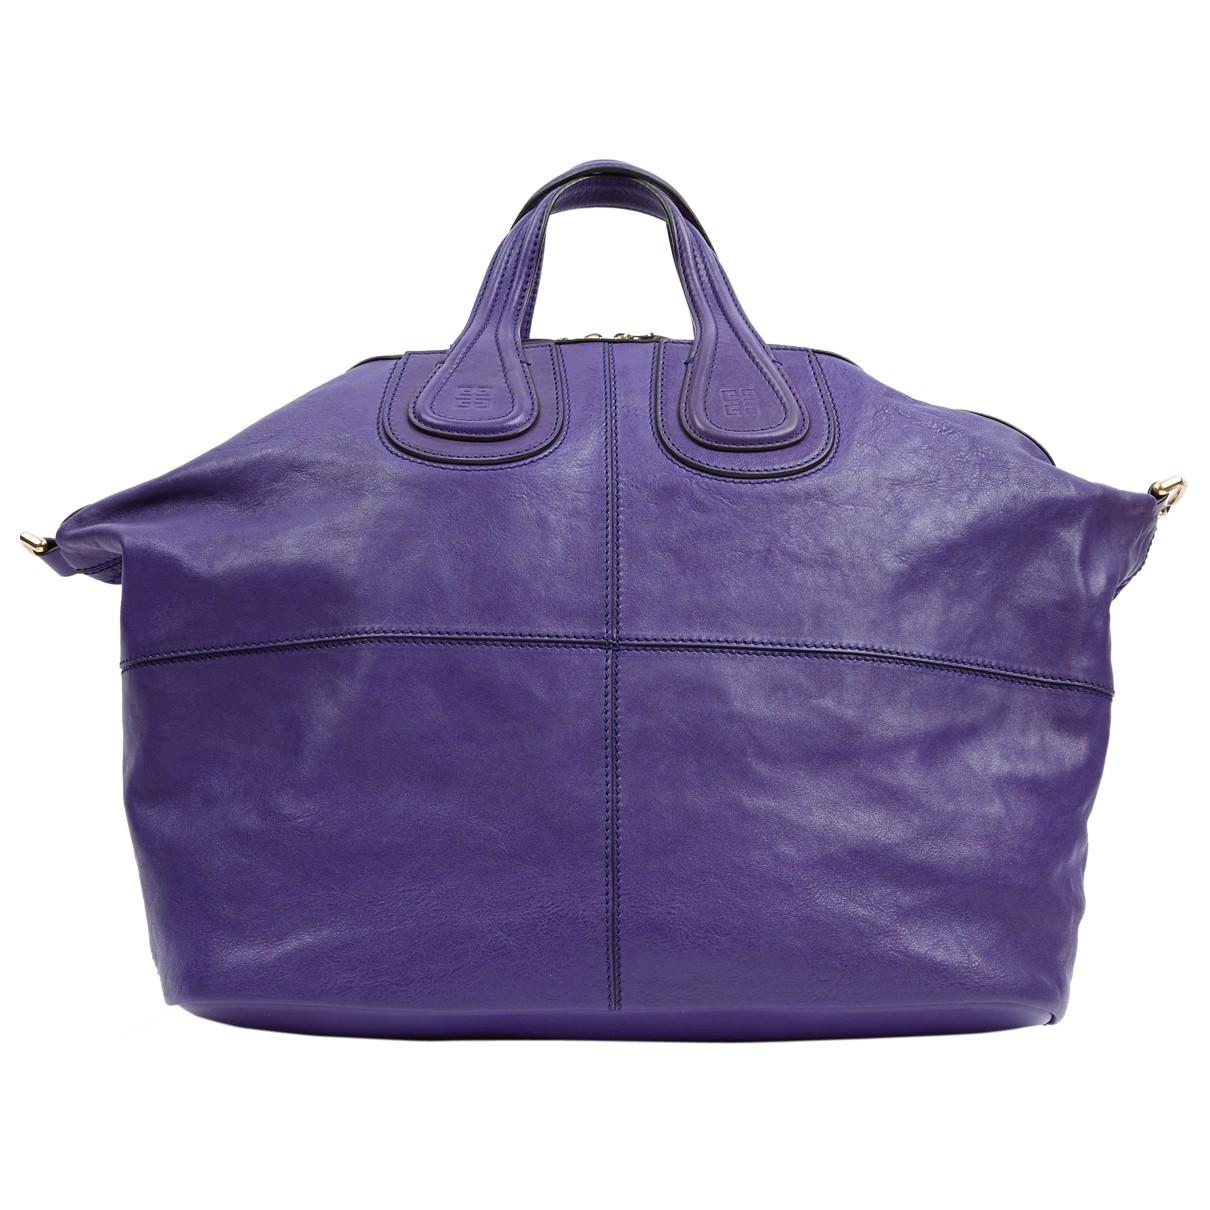 Givenchy \N Blue Leather handbag for Women \N